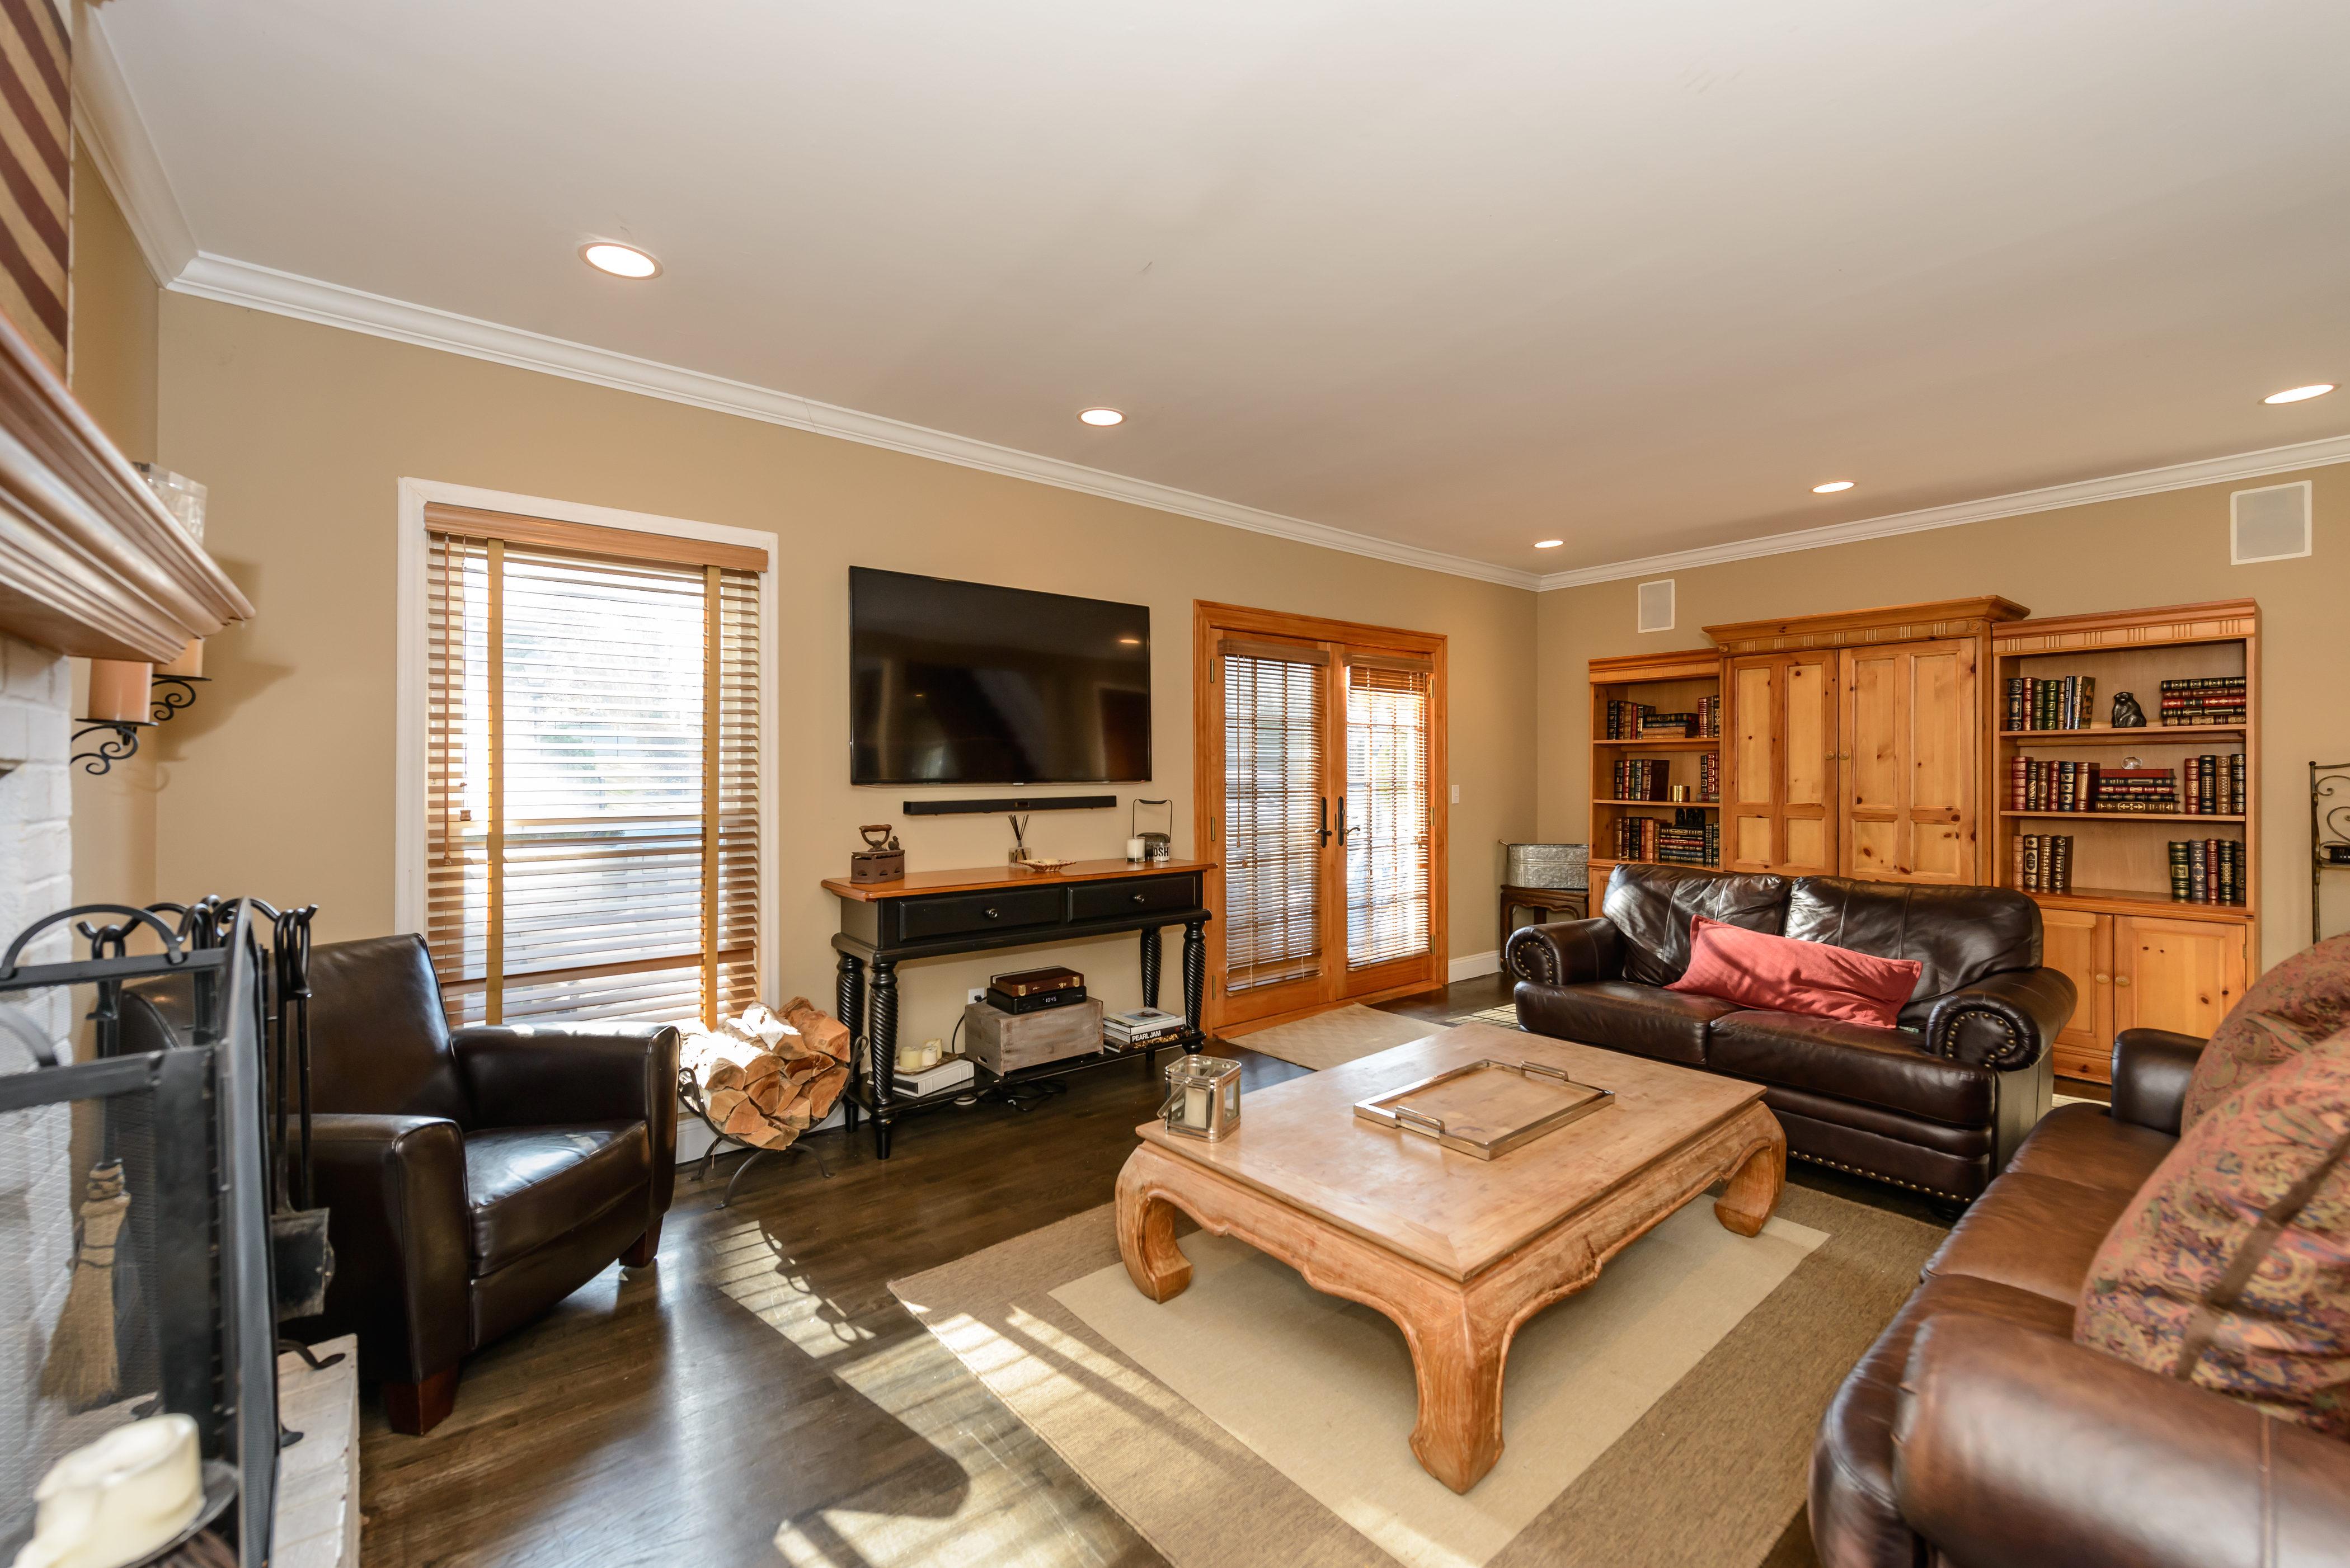 Condominium for Sale at Condo 208 Fen Way Syosset, New York, 11791 United States